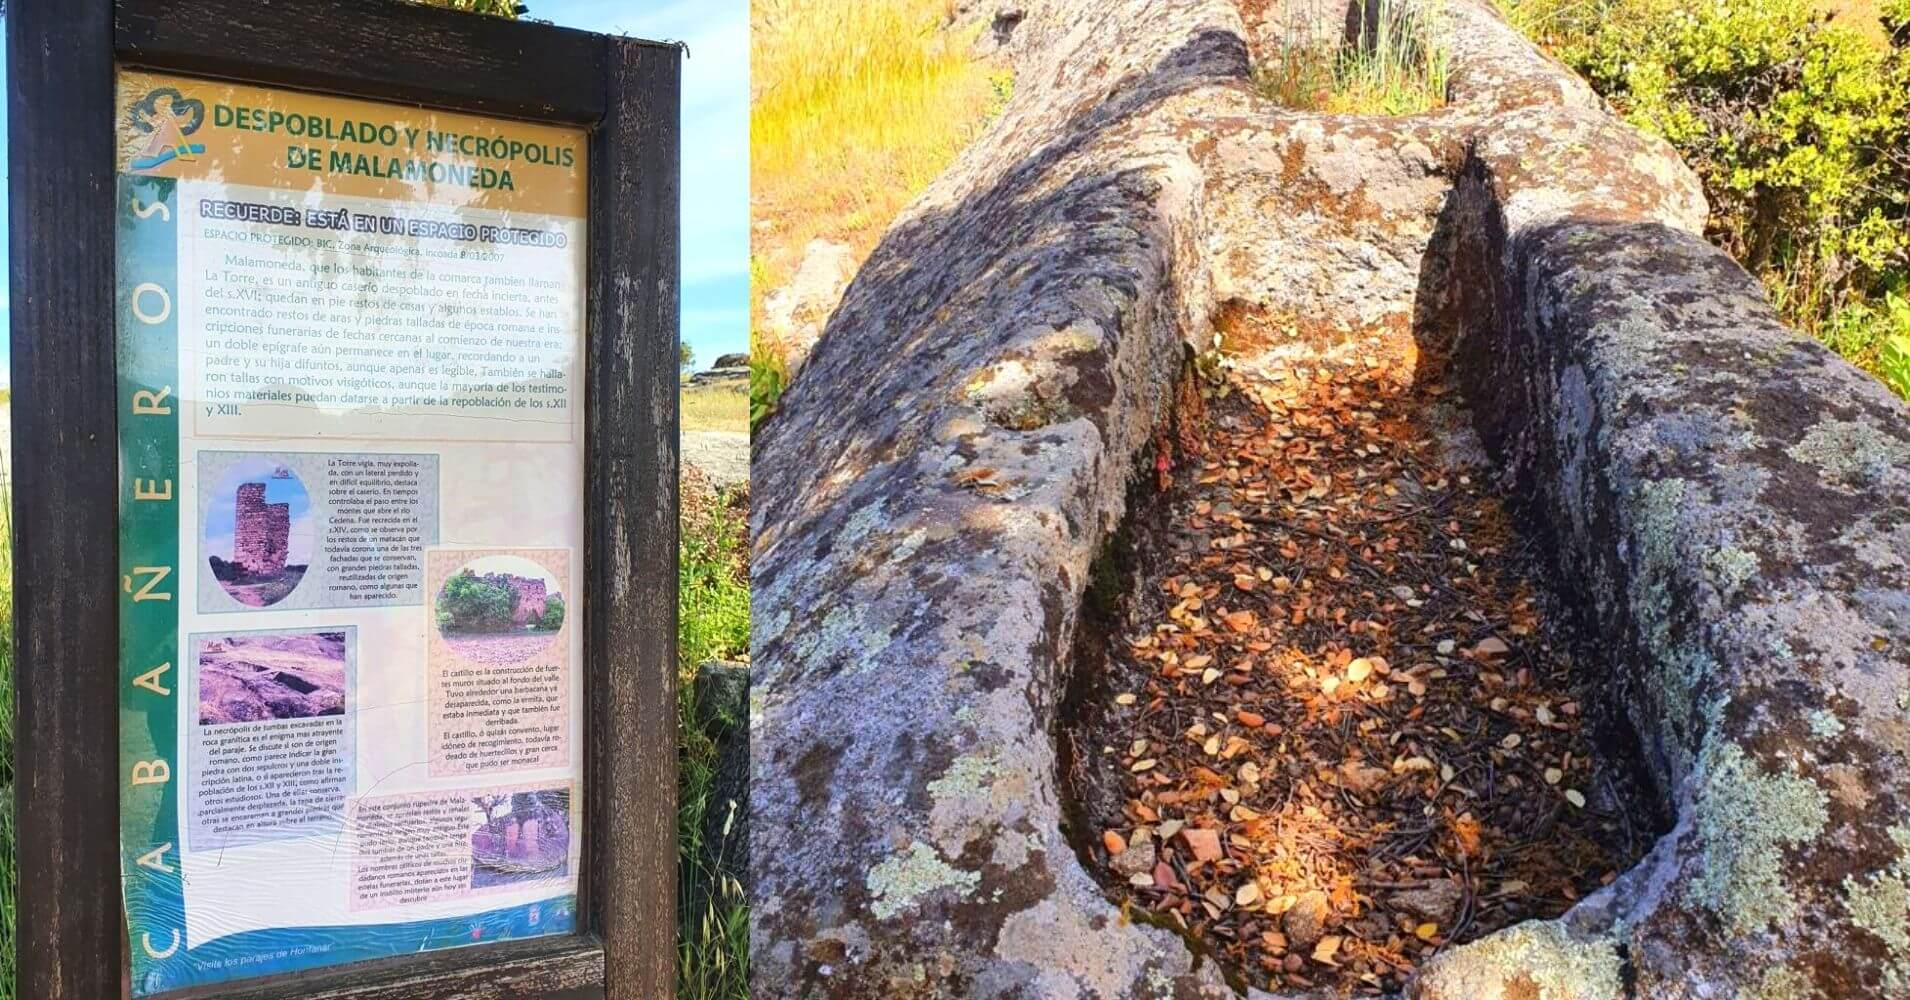 Paneles Informativos y Necrópolis del Paseo por Malamoneda.